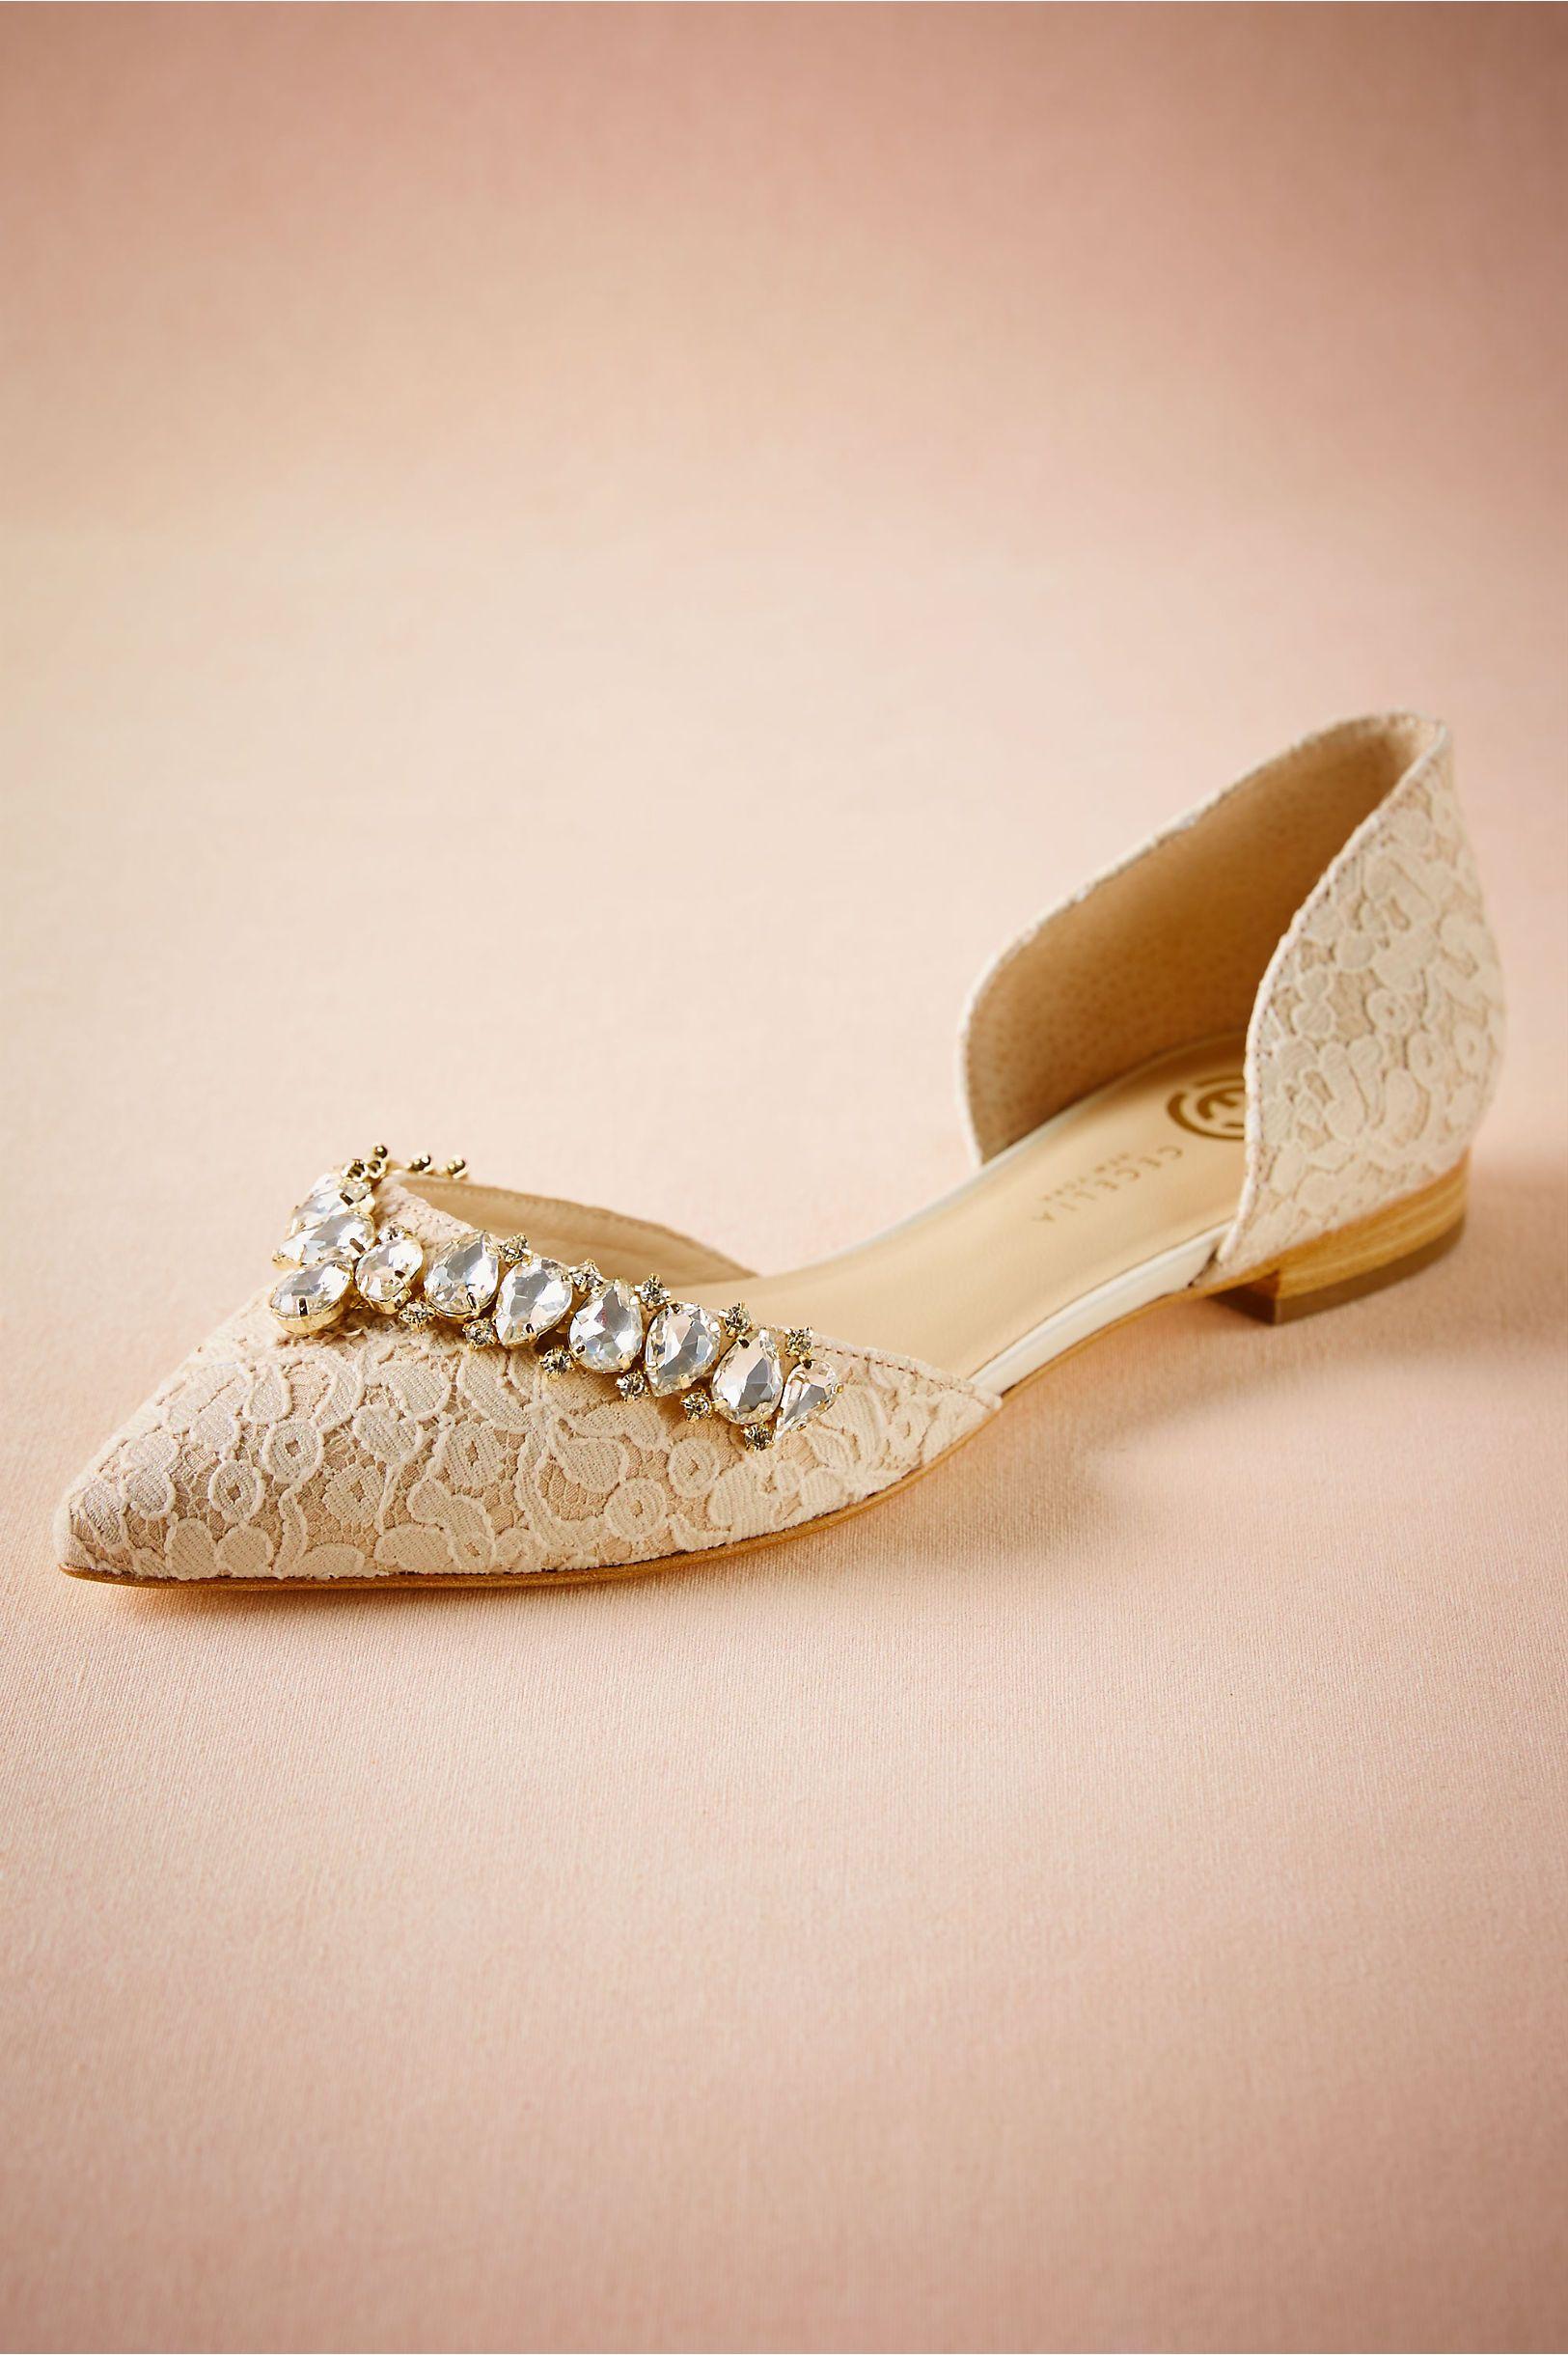 85e31b400121 BHLDN Lotti Lace Flats in Bride Bridal Shoes & Accessories Bridal Shoes |  BHLDN